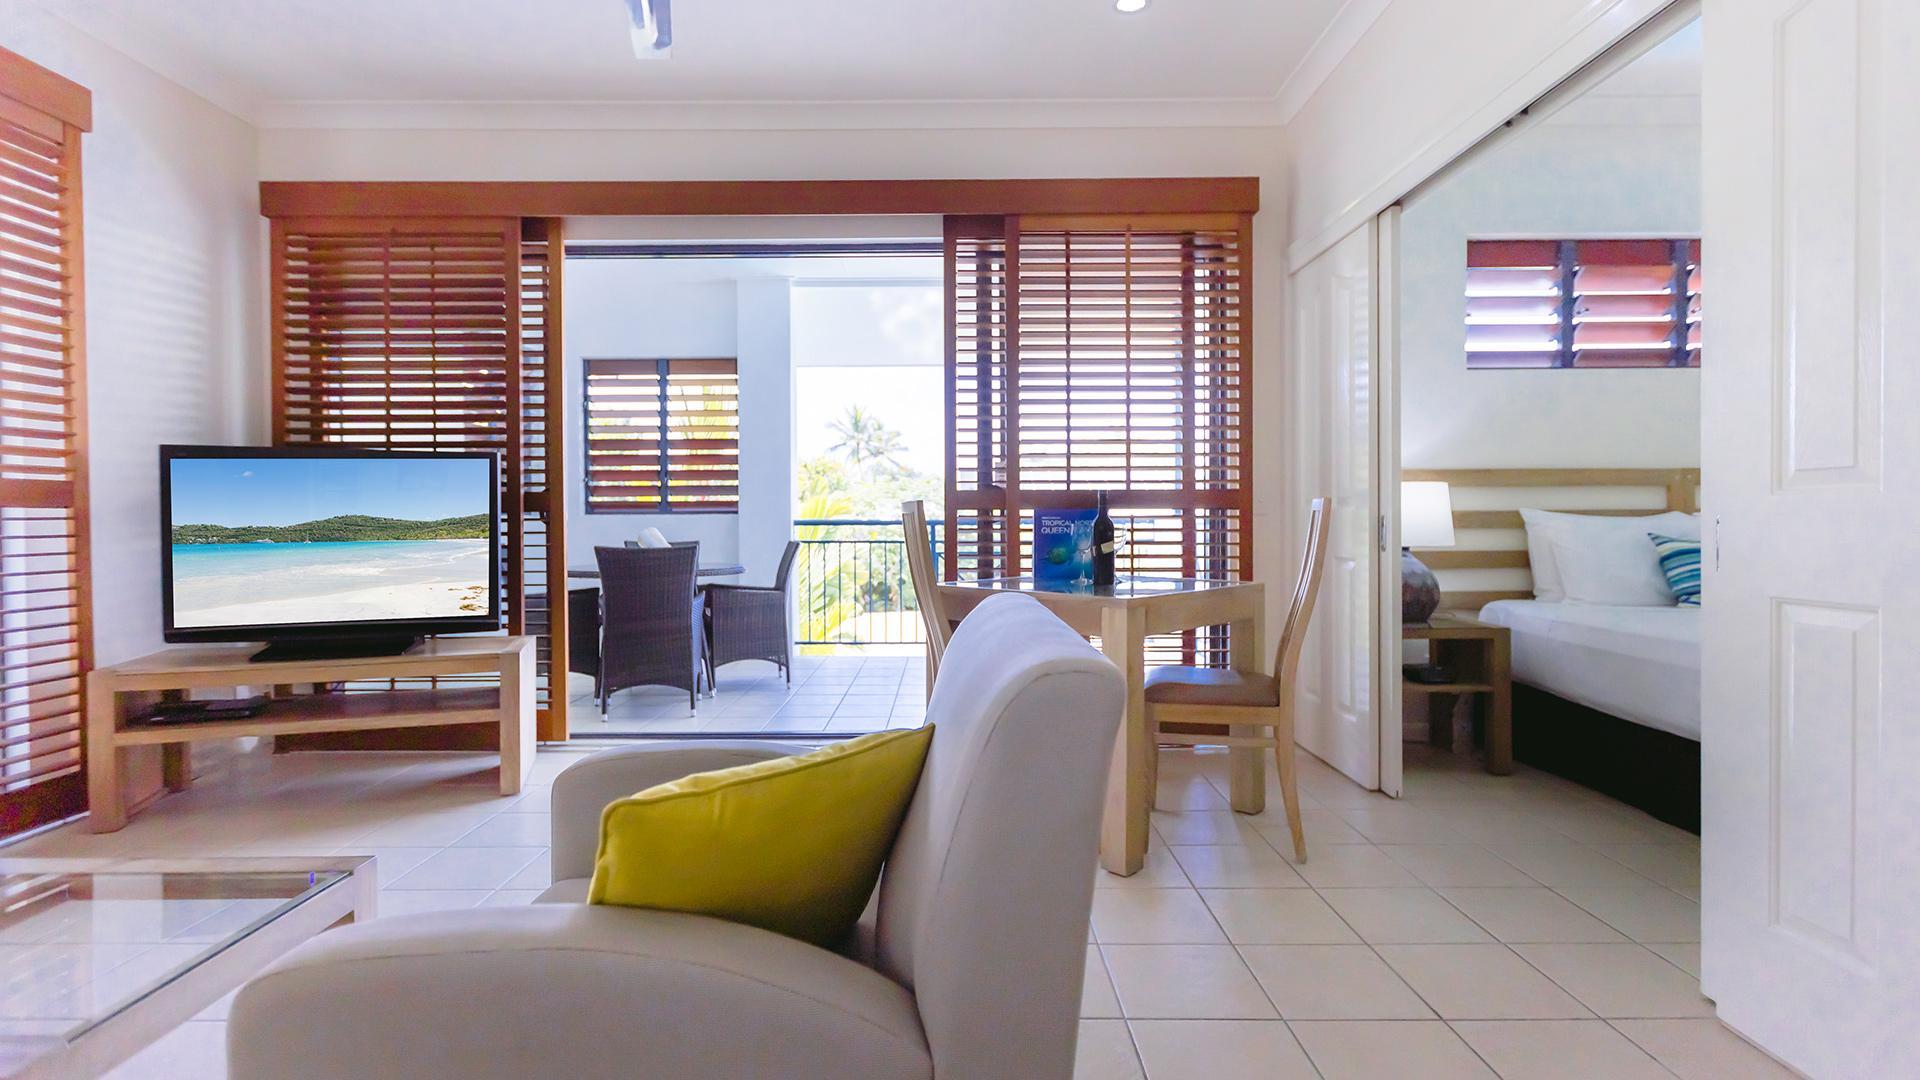 One-Bedroom Premier Apartment JUL21 image 1 at Meridian Port Douglas by Douglas Shire, Queensland, Australia